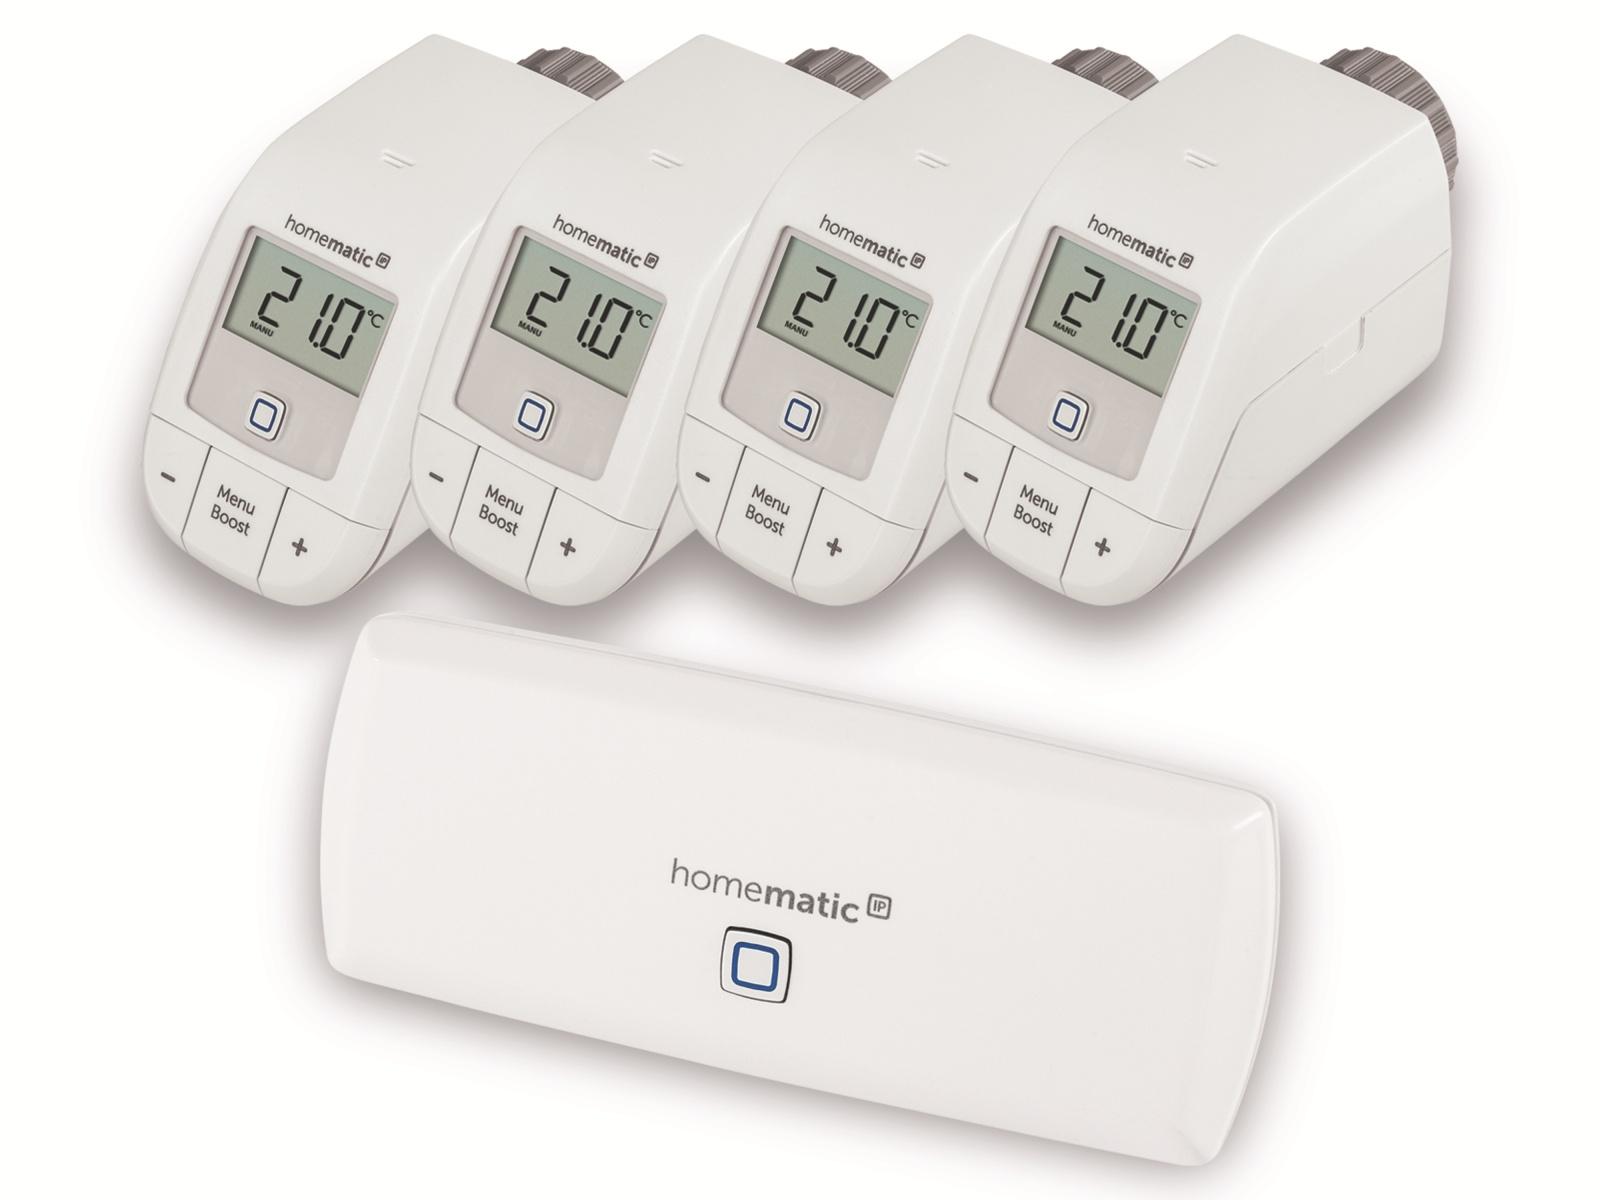 [Pollin] Homematic IP Set Heizen: 4x Basic-Thermostat + WLAN-AP